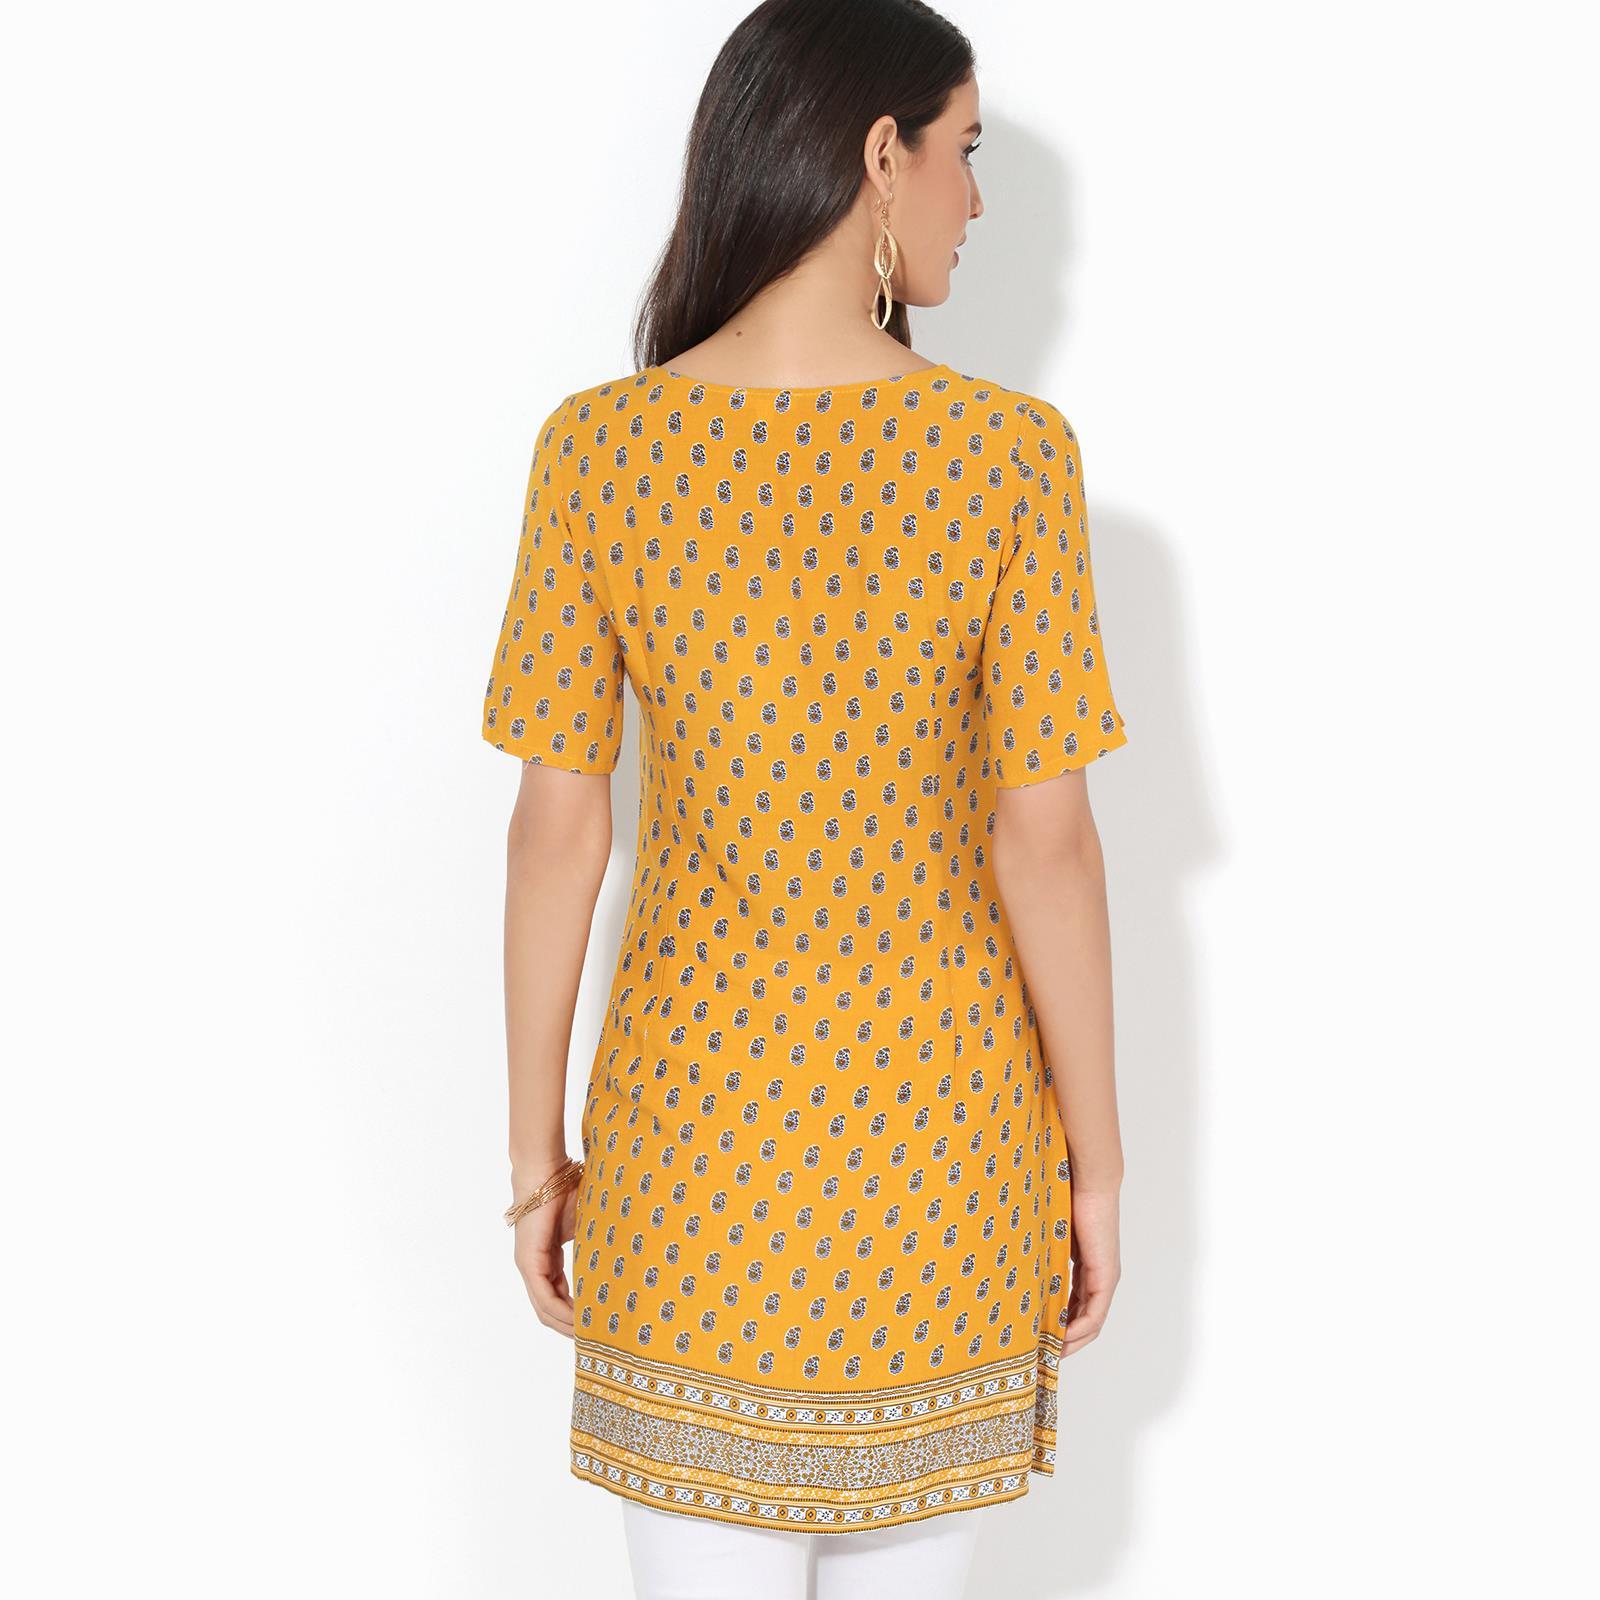 Womens-Ladies-Boho-Tunic-Top-Blouse-Button-Down-Printed-Long-Loose-Casual-Shirt thumbnail 3